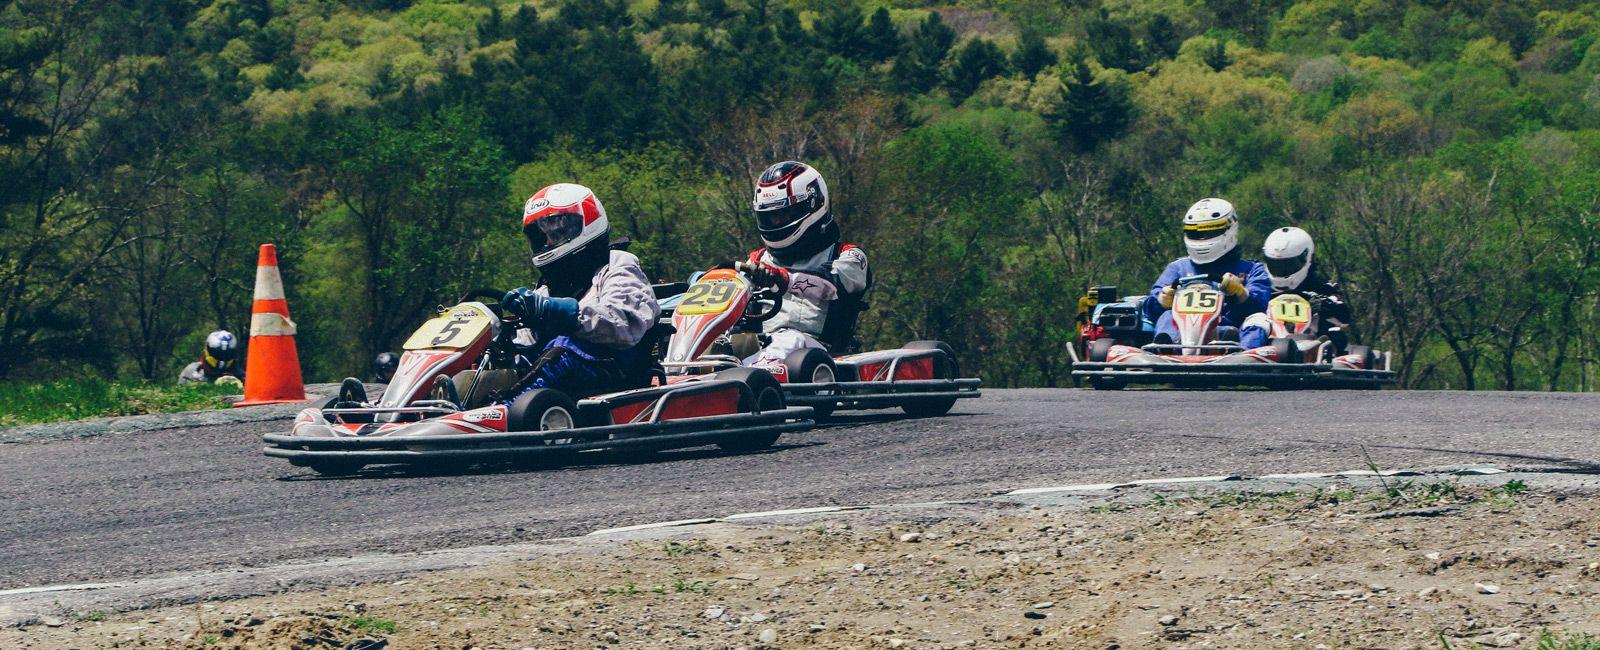 Endurance-Karting-Gear-Patrol-Lead-1600